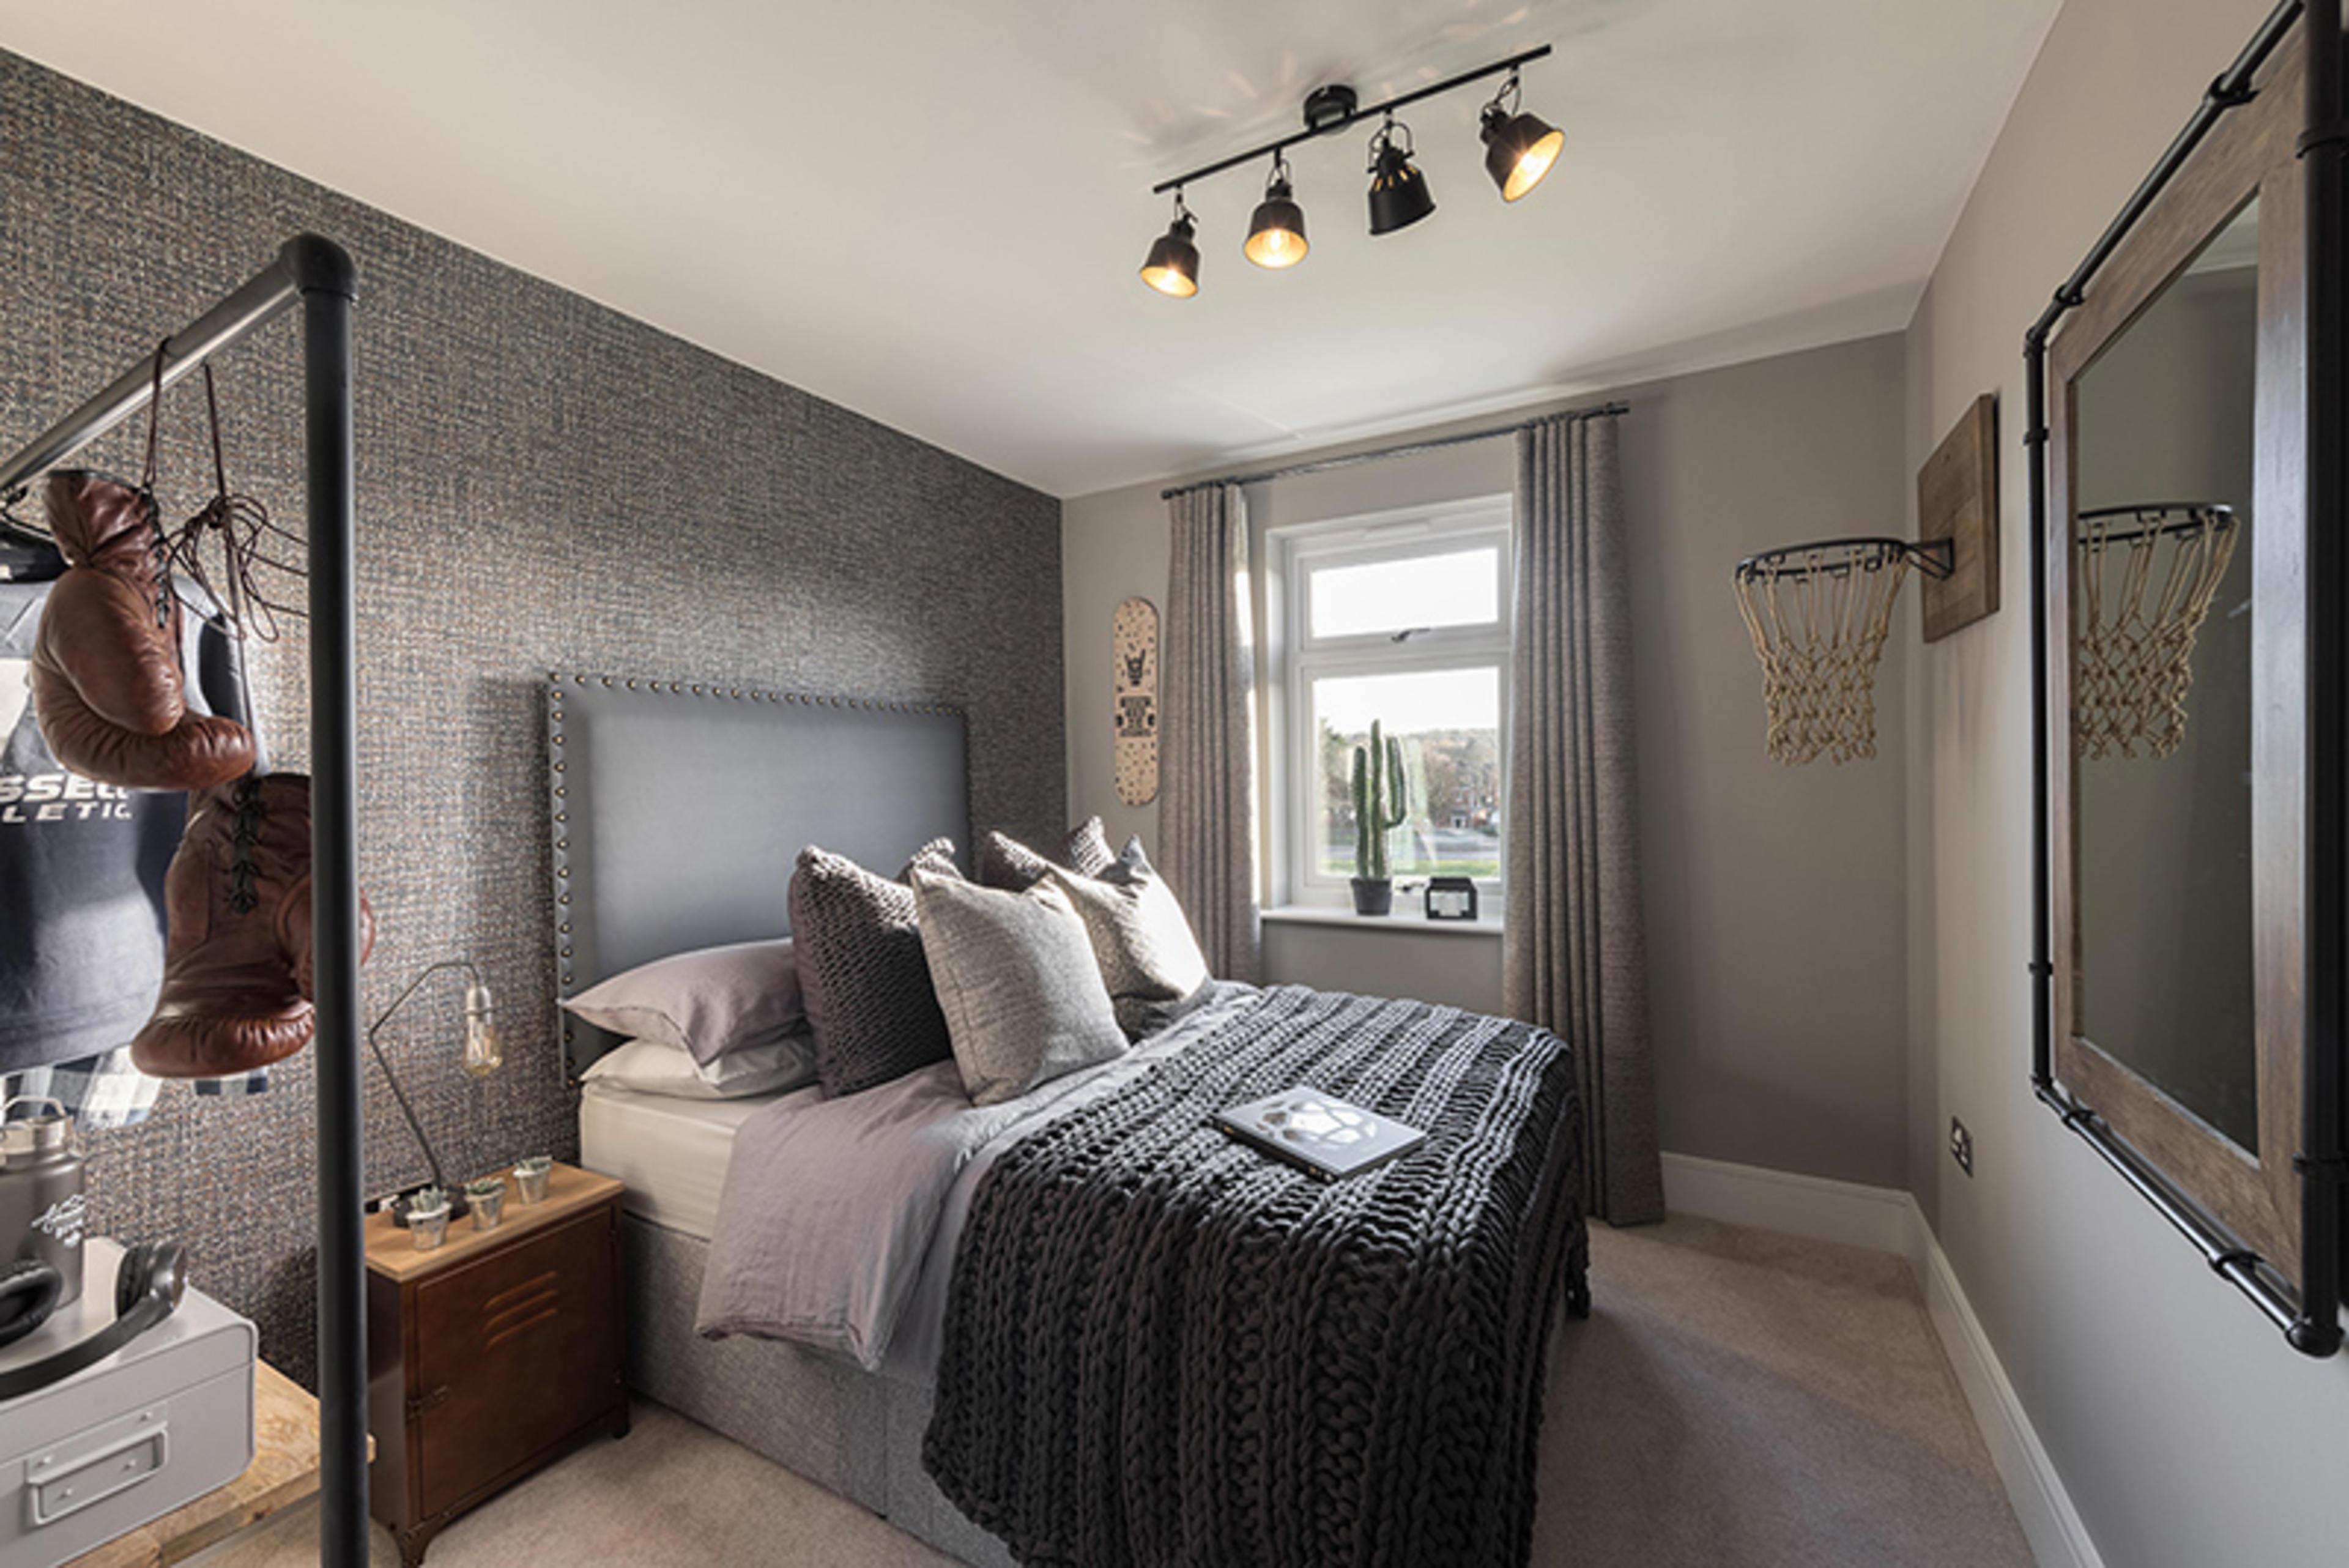 watling-grange-harrogate-merevale-4-bed-home-third-double-bedroom-1